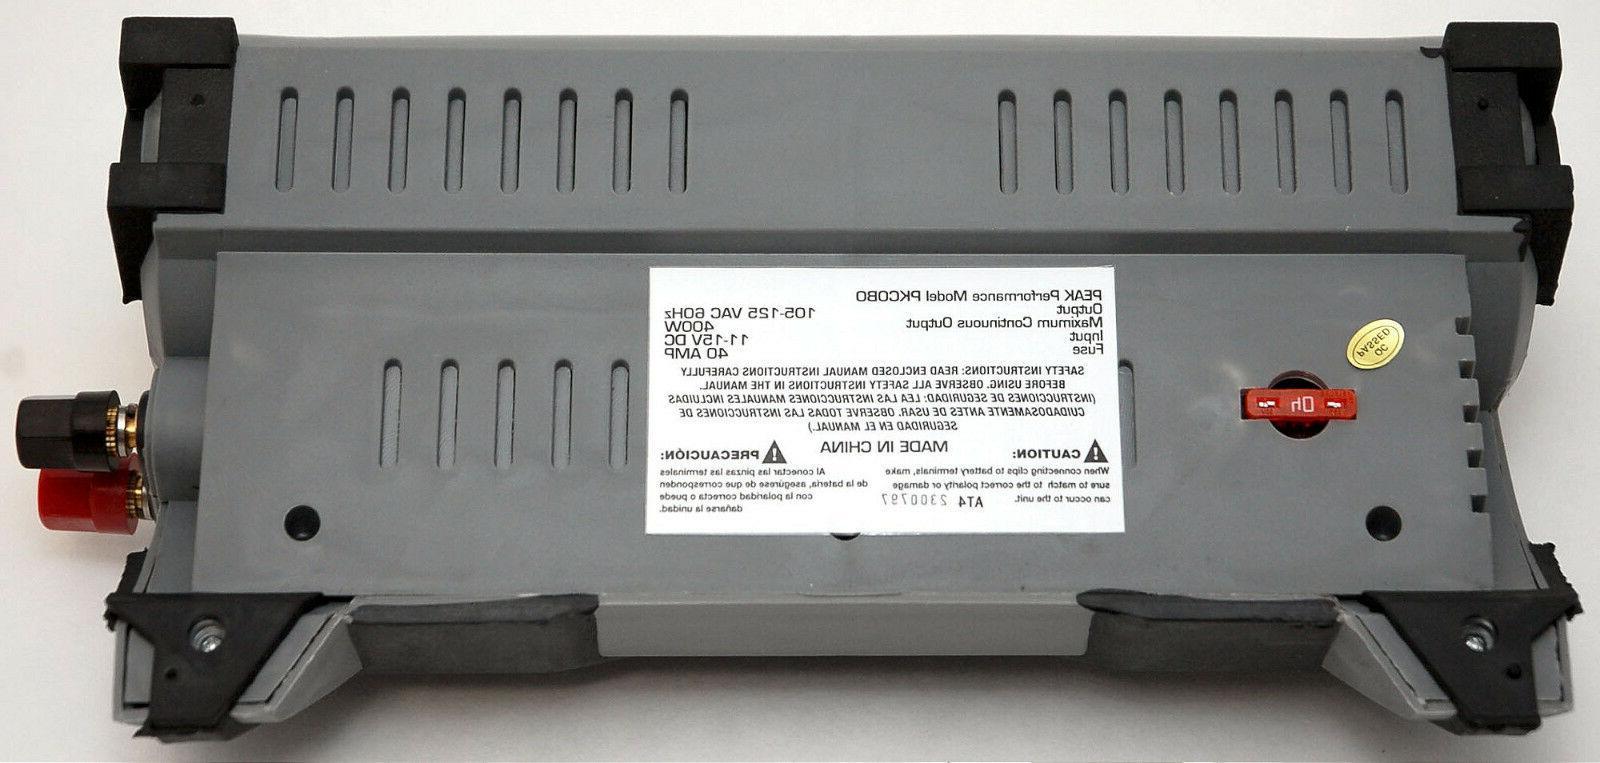 Peak Watt RV Car Portable DC 12v AC 120v Charger